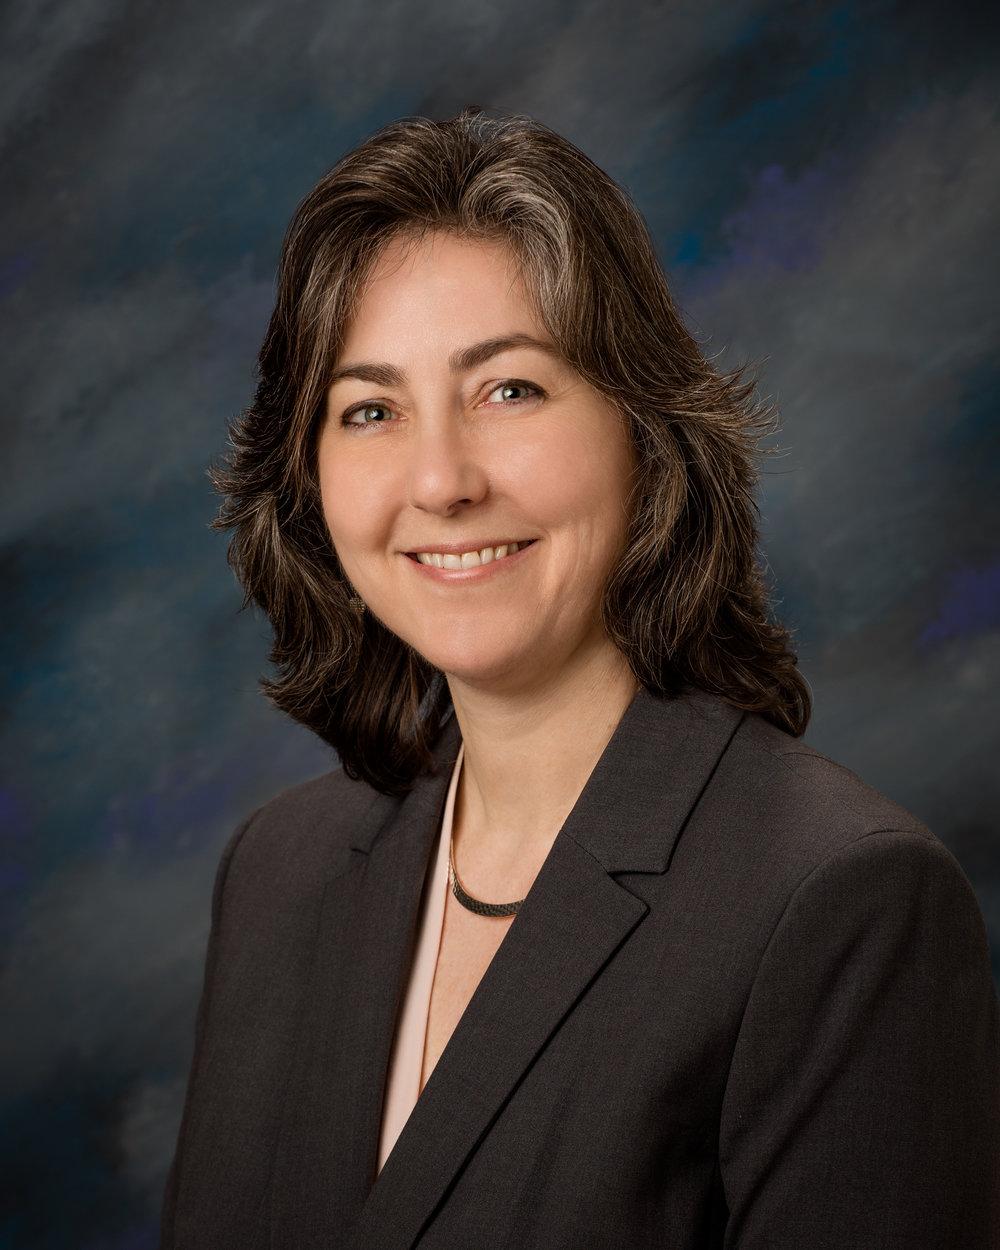 Lynn Haig    @CityofBptCT   Director of Planning, Office of Planning & Economic Development, City of Bridgeport, Connecticut